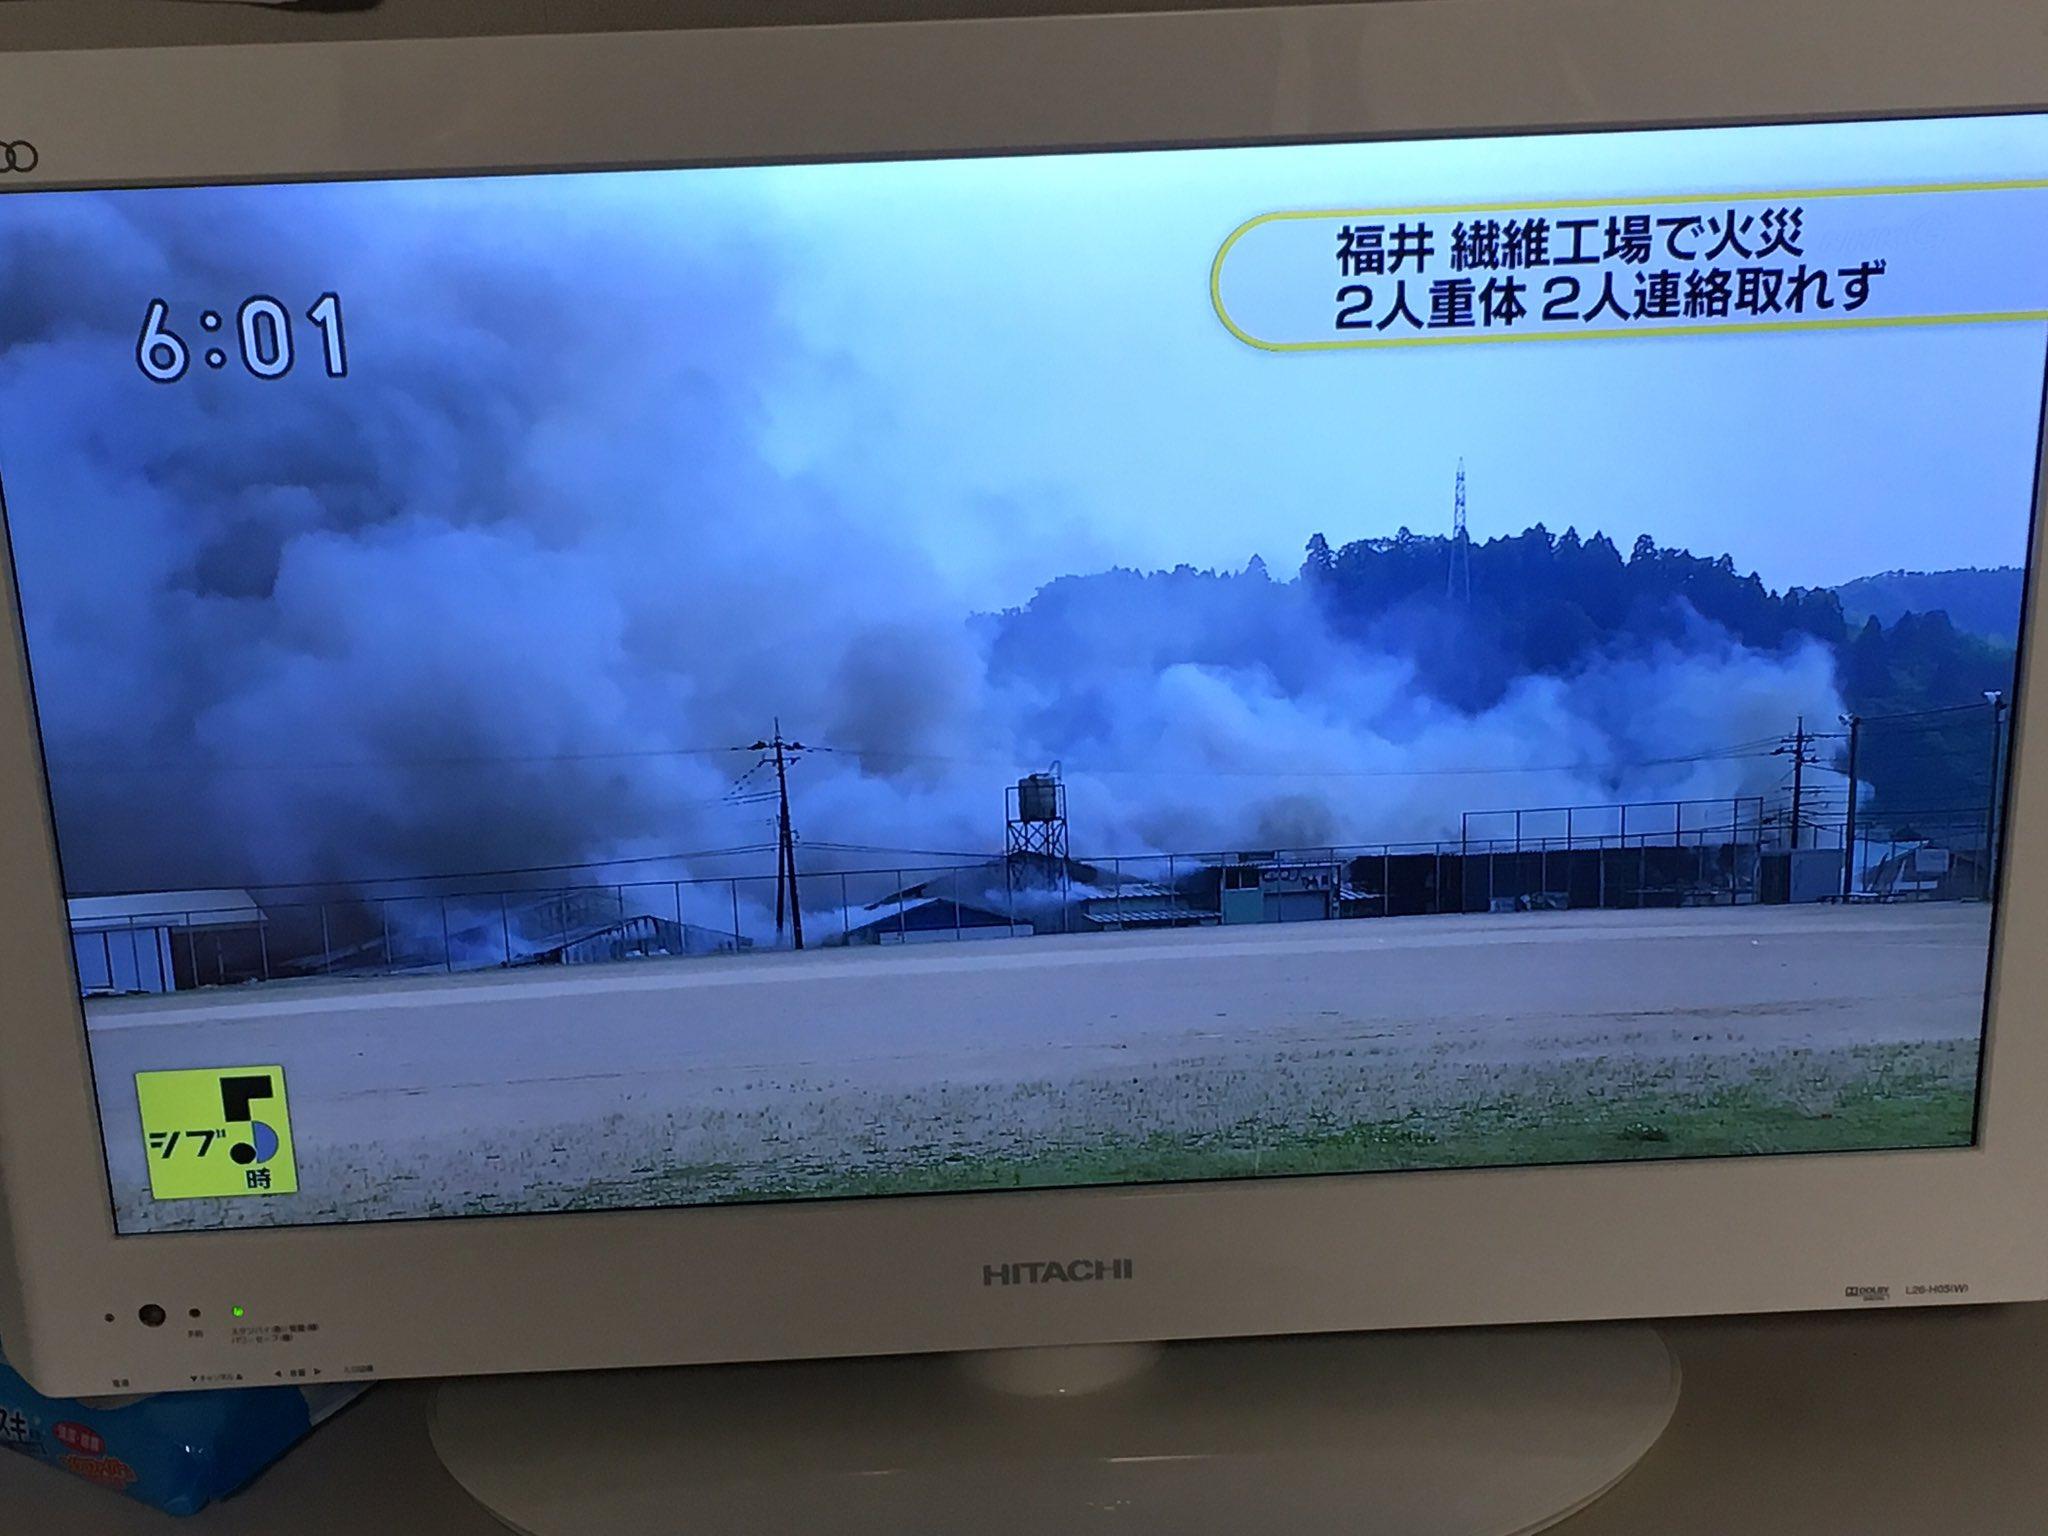 画像,福井県永平寺町にて、繊維工場火災‼️ https://t.co/qKzemOwDYt。